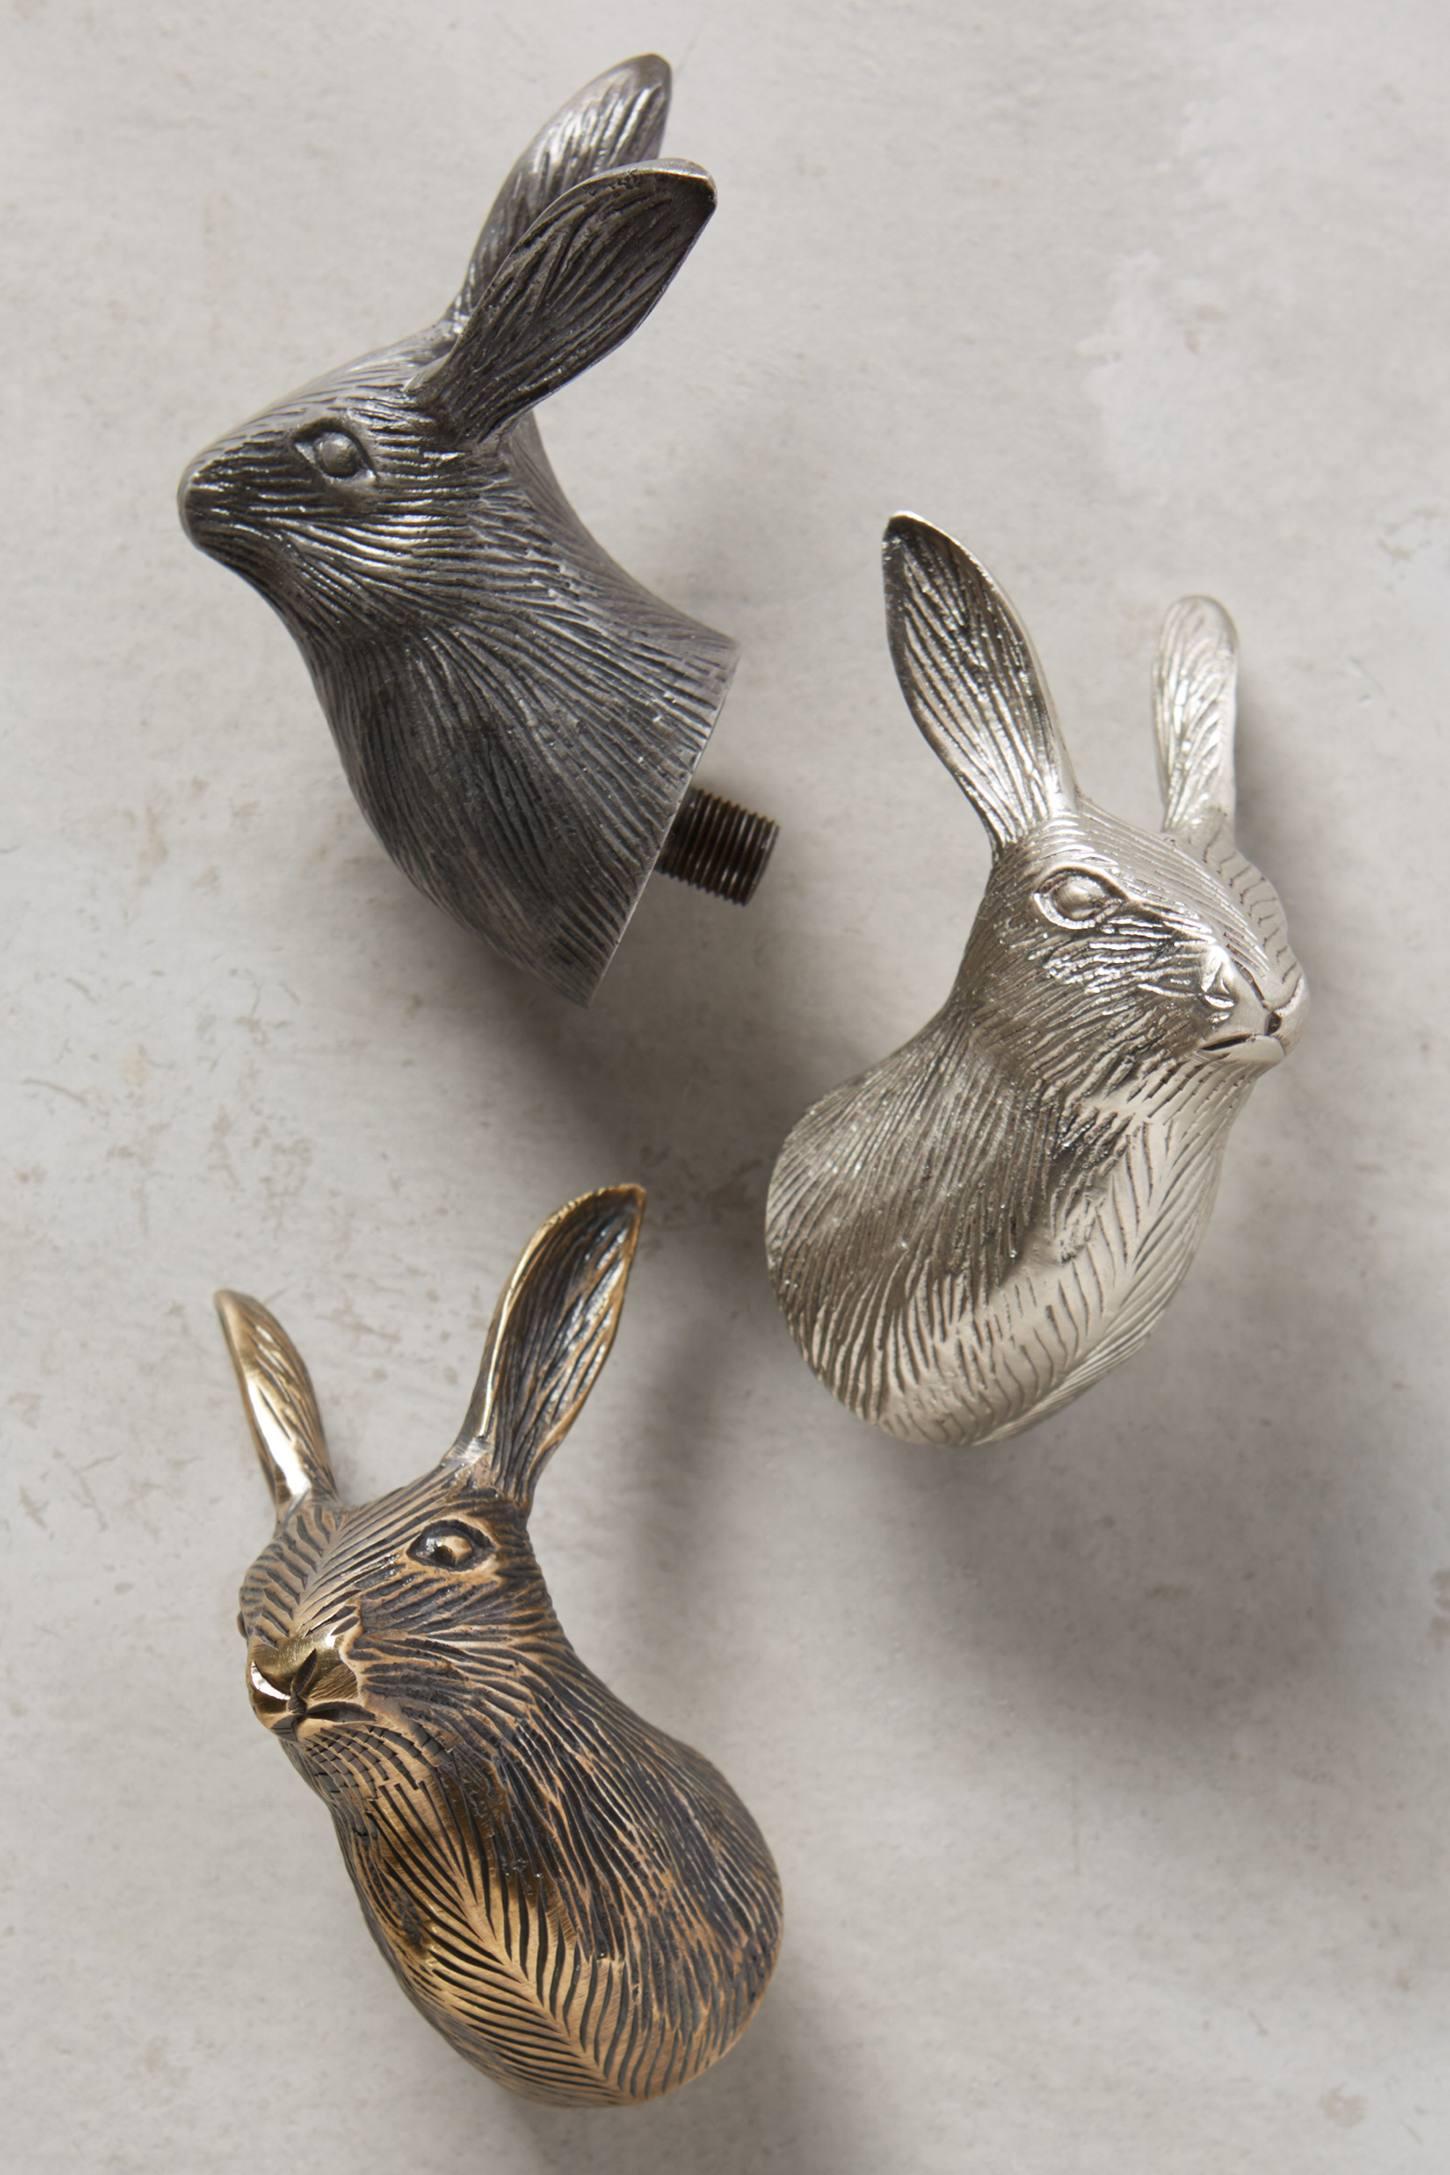 Leaping Rabbit Finials